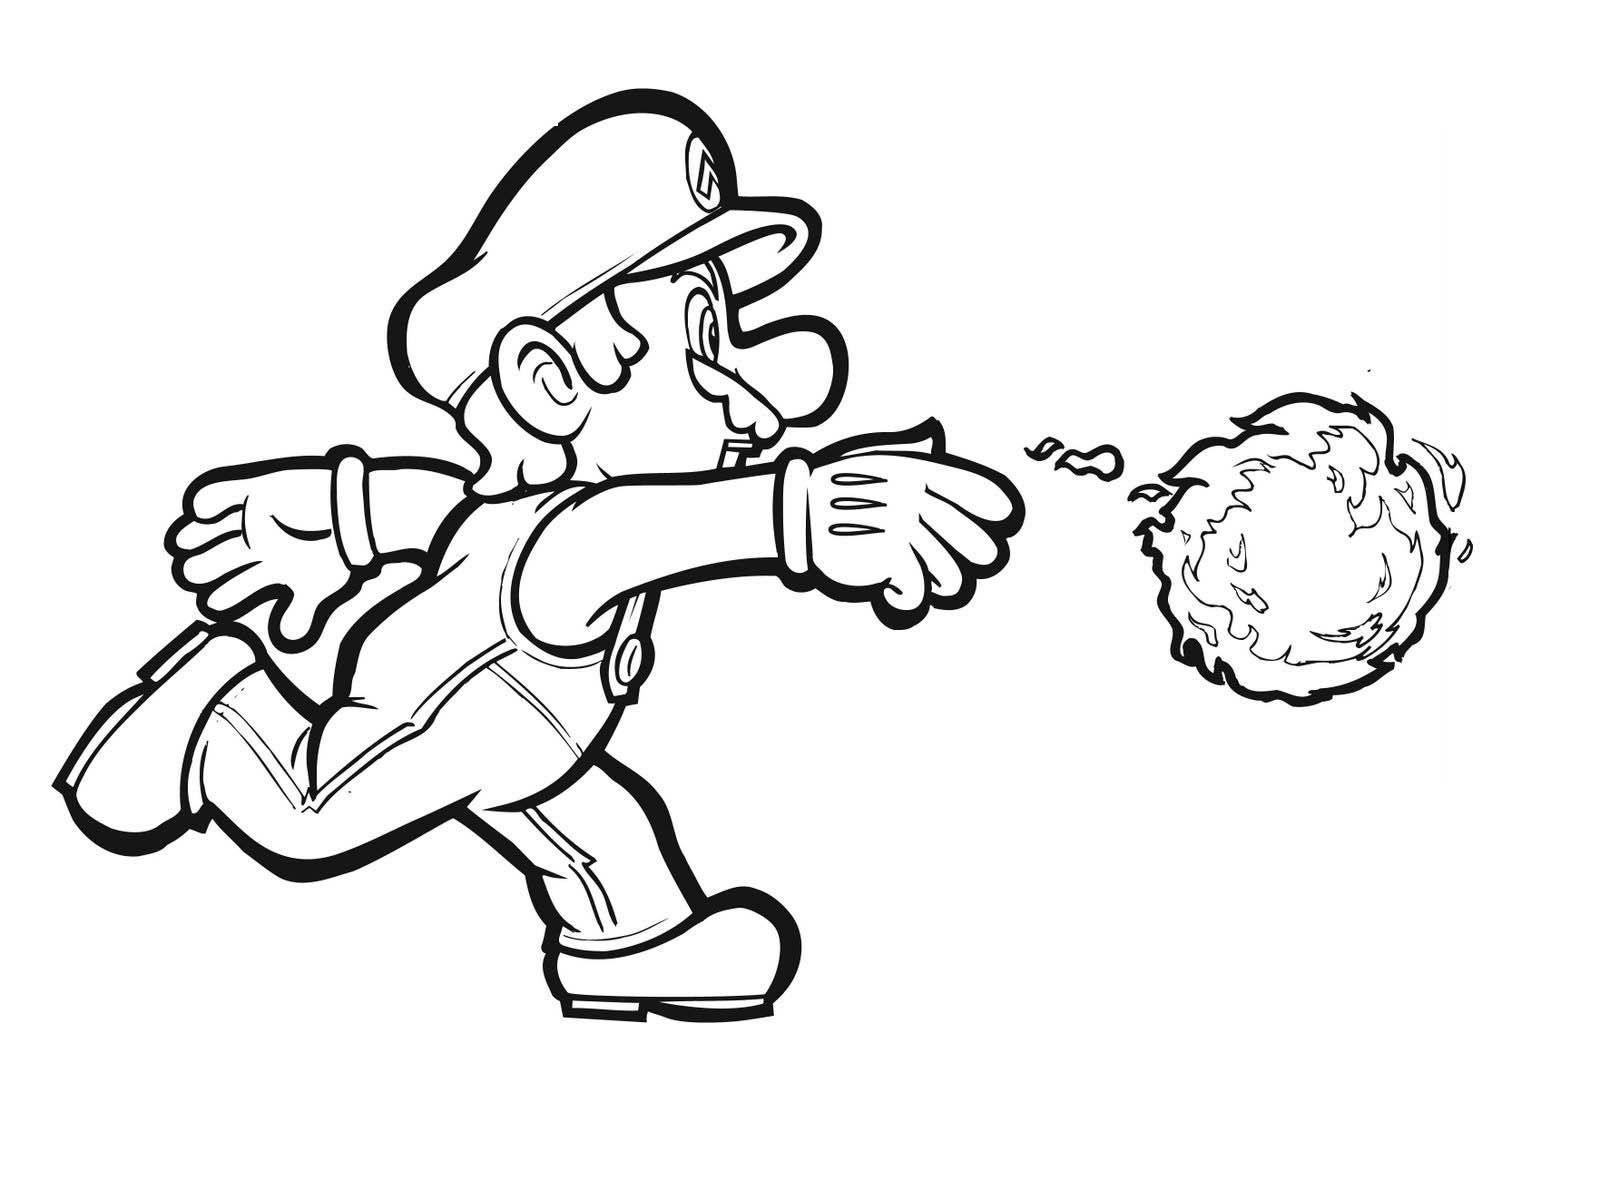 Super Mario Coloring Pages | Mario Party Ideas | Pinterest